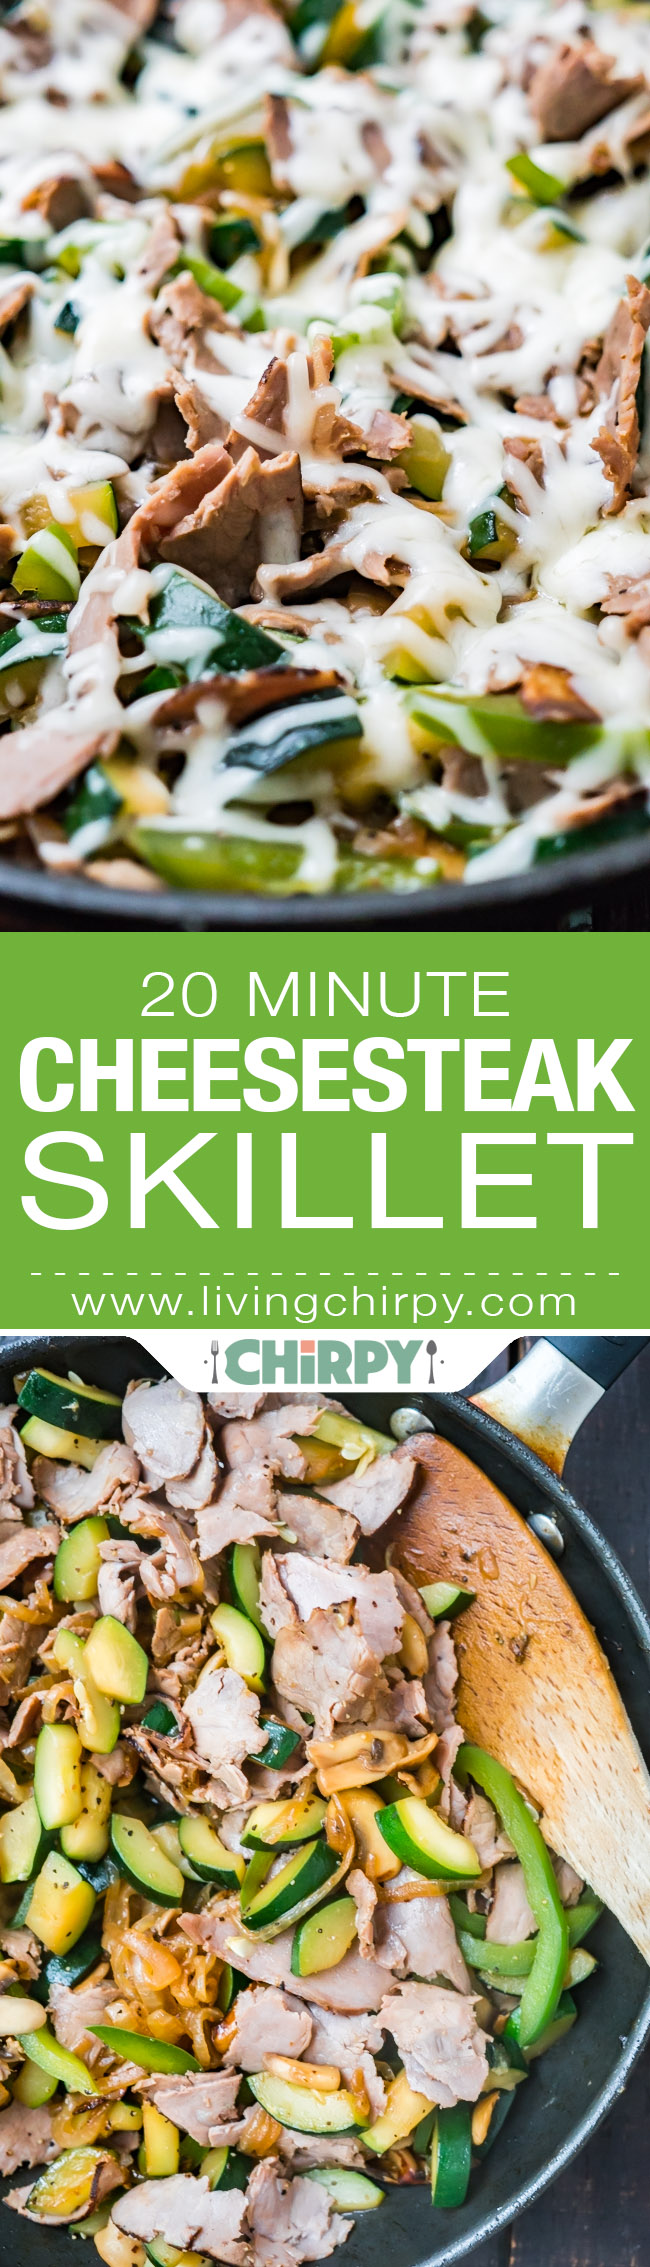 20 Minute Cheesesteak Skillet